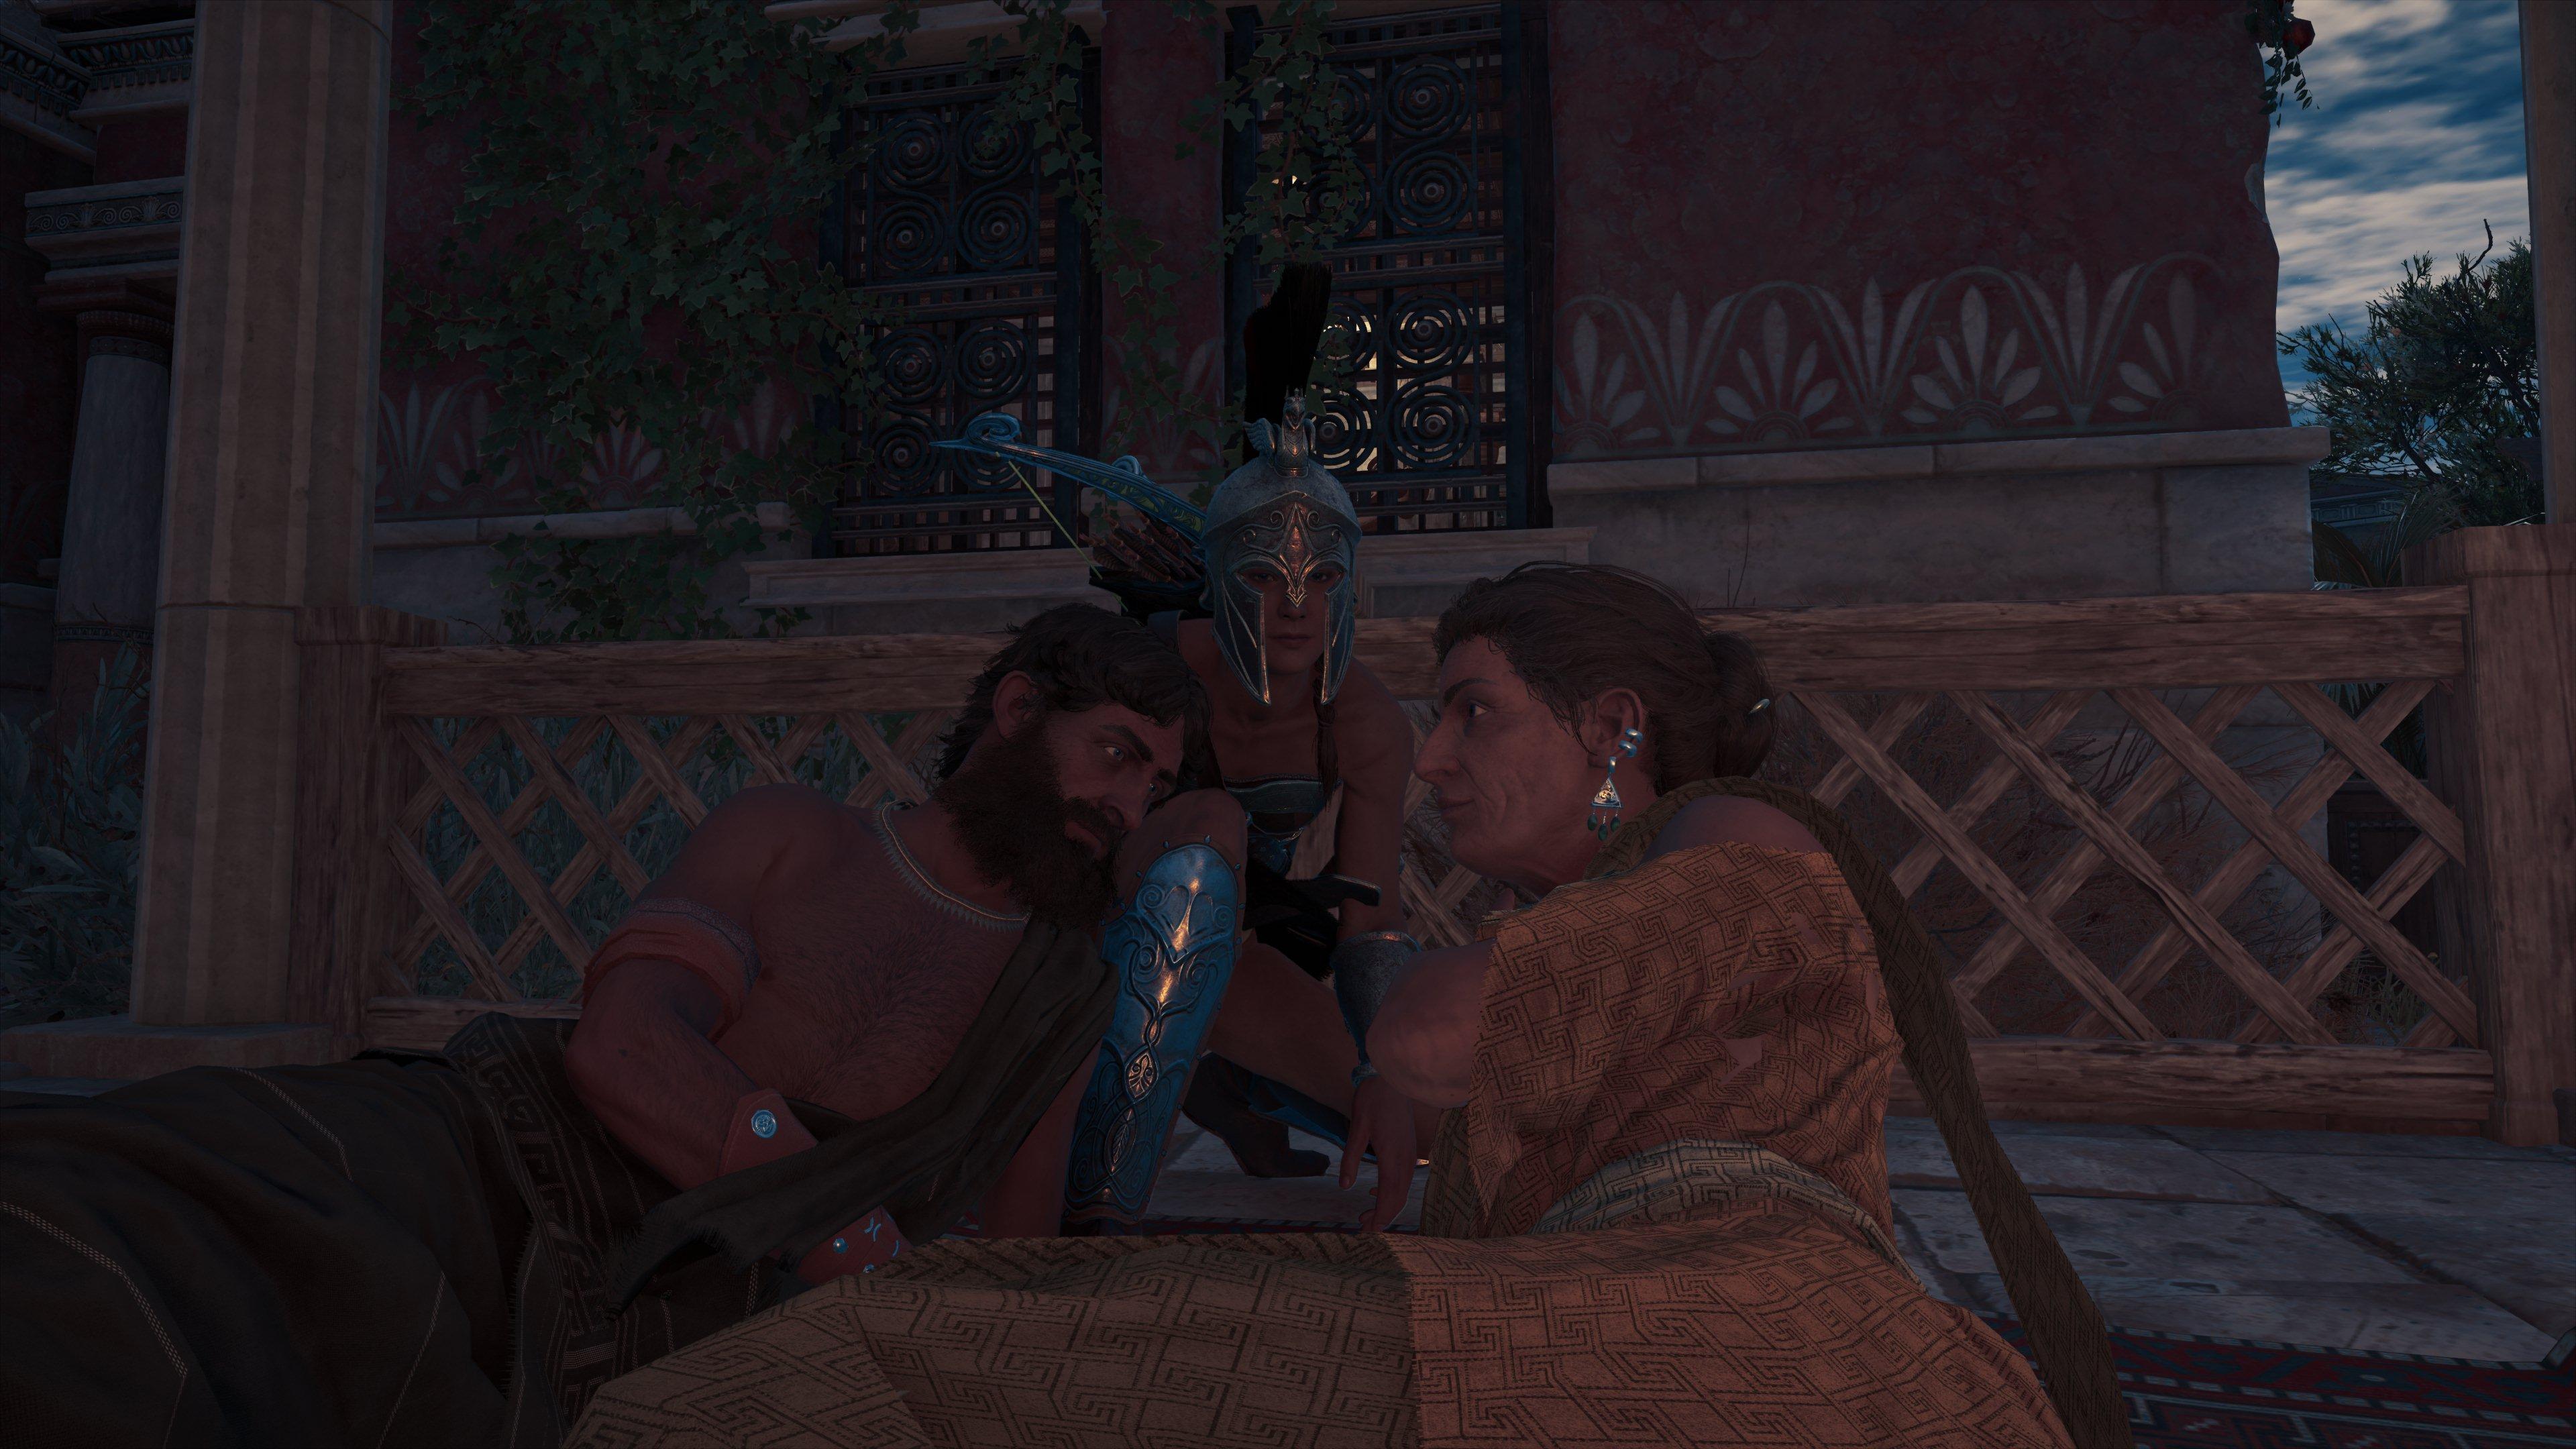 2018118173226.jpg - Assassin's Creed: Odyssey